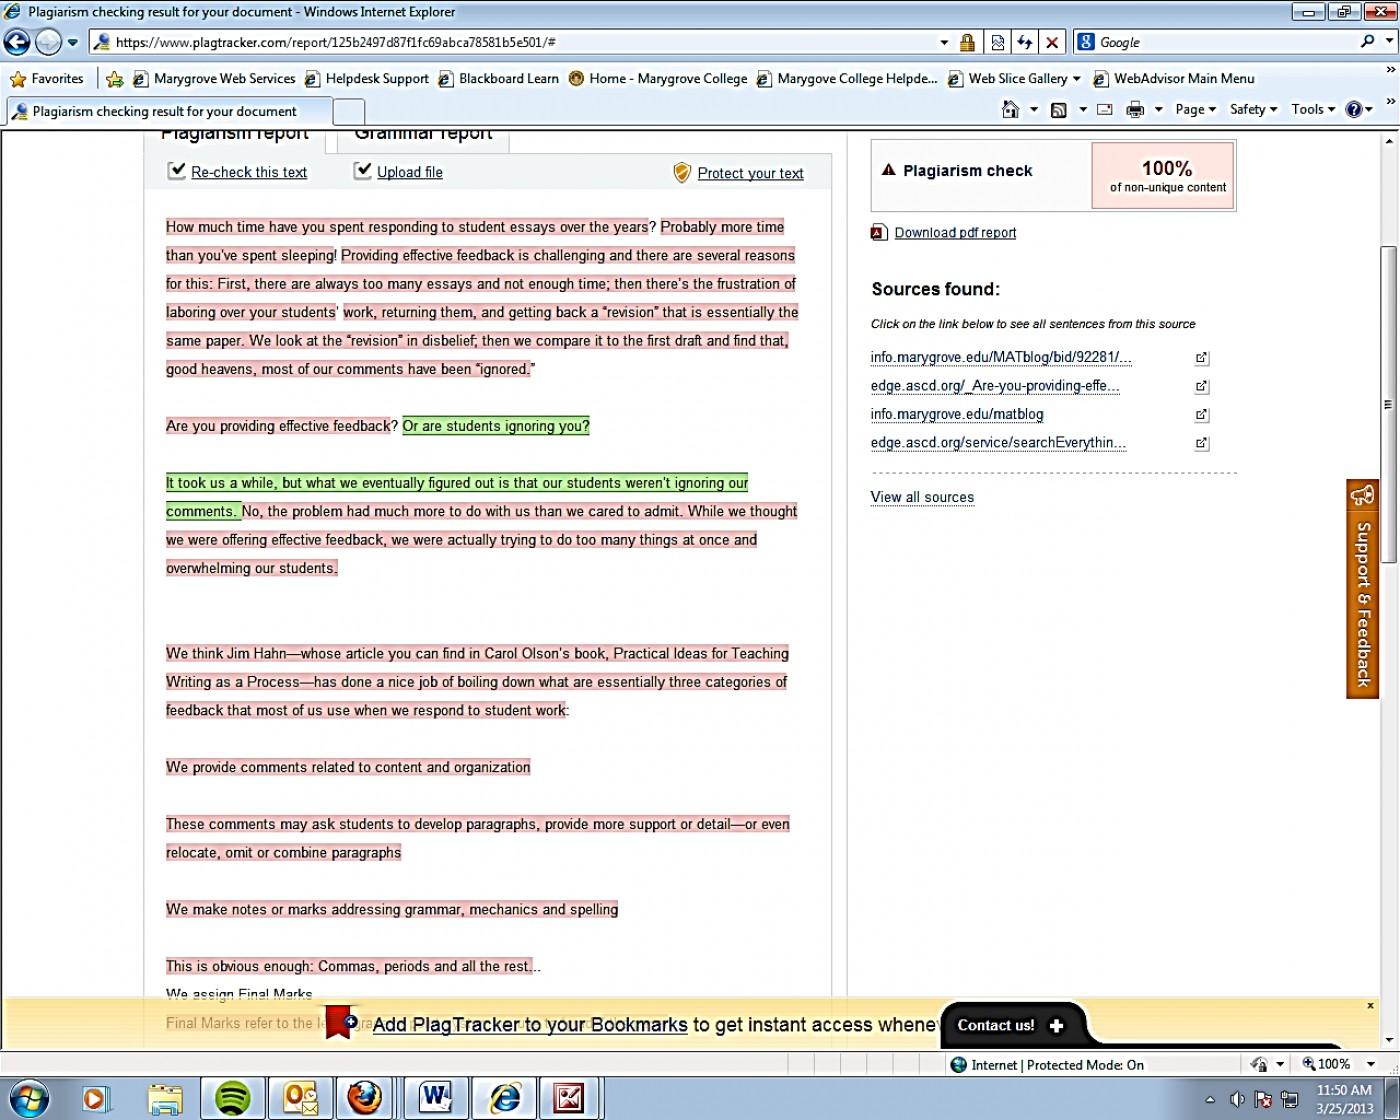 006 Essay Checker Free Online Amazing Sentence Grammar Plagiarism Document 1400